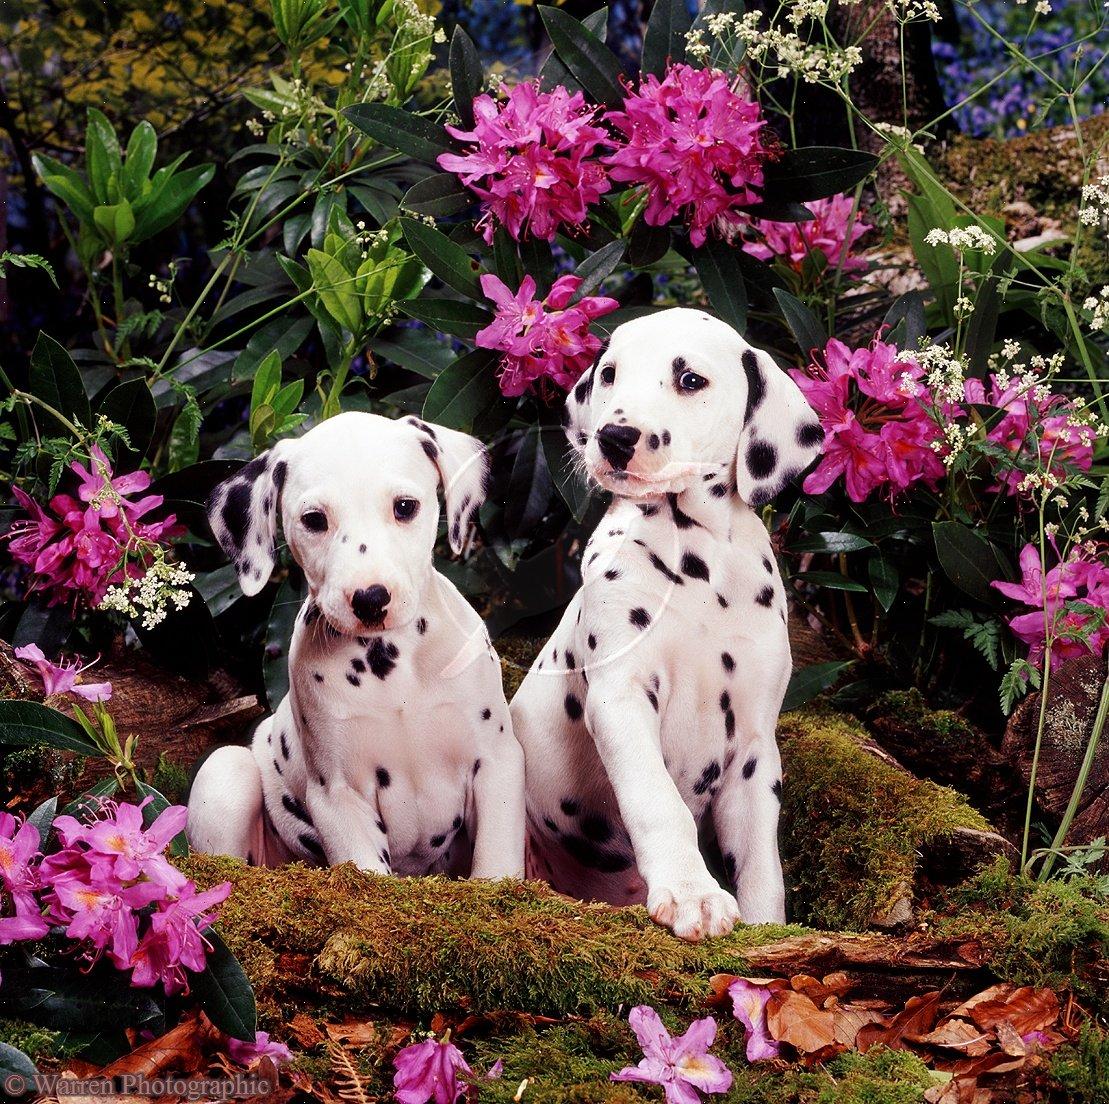 Щенки далматина в цветах фото